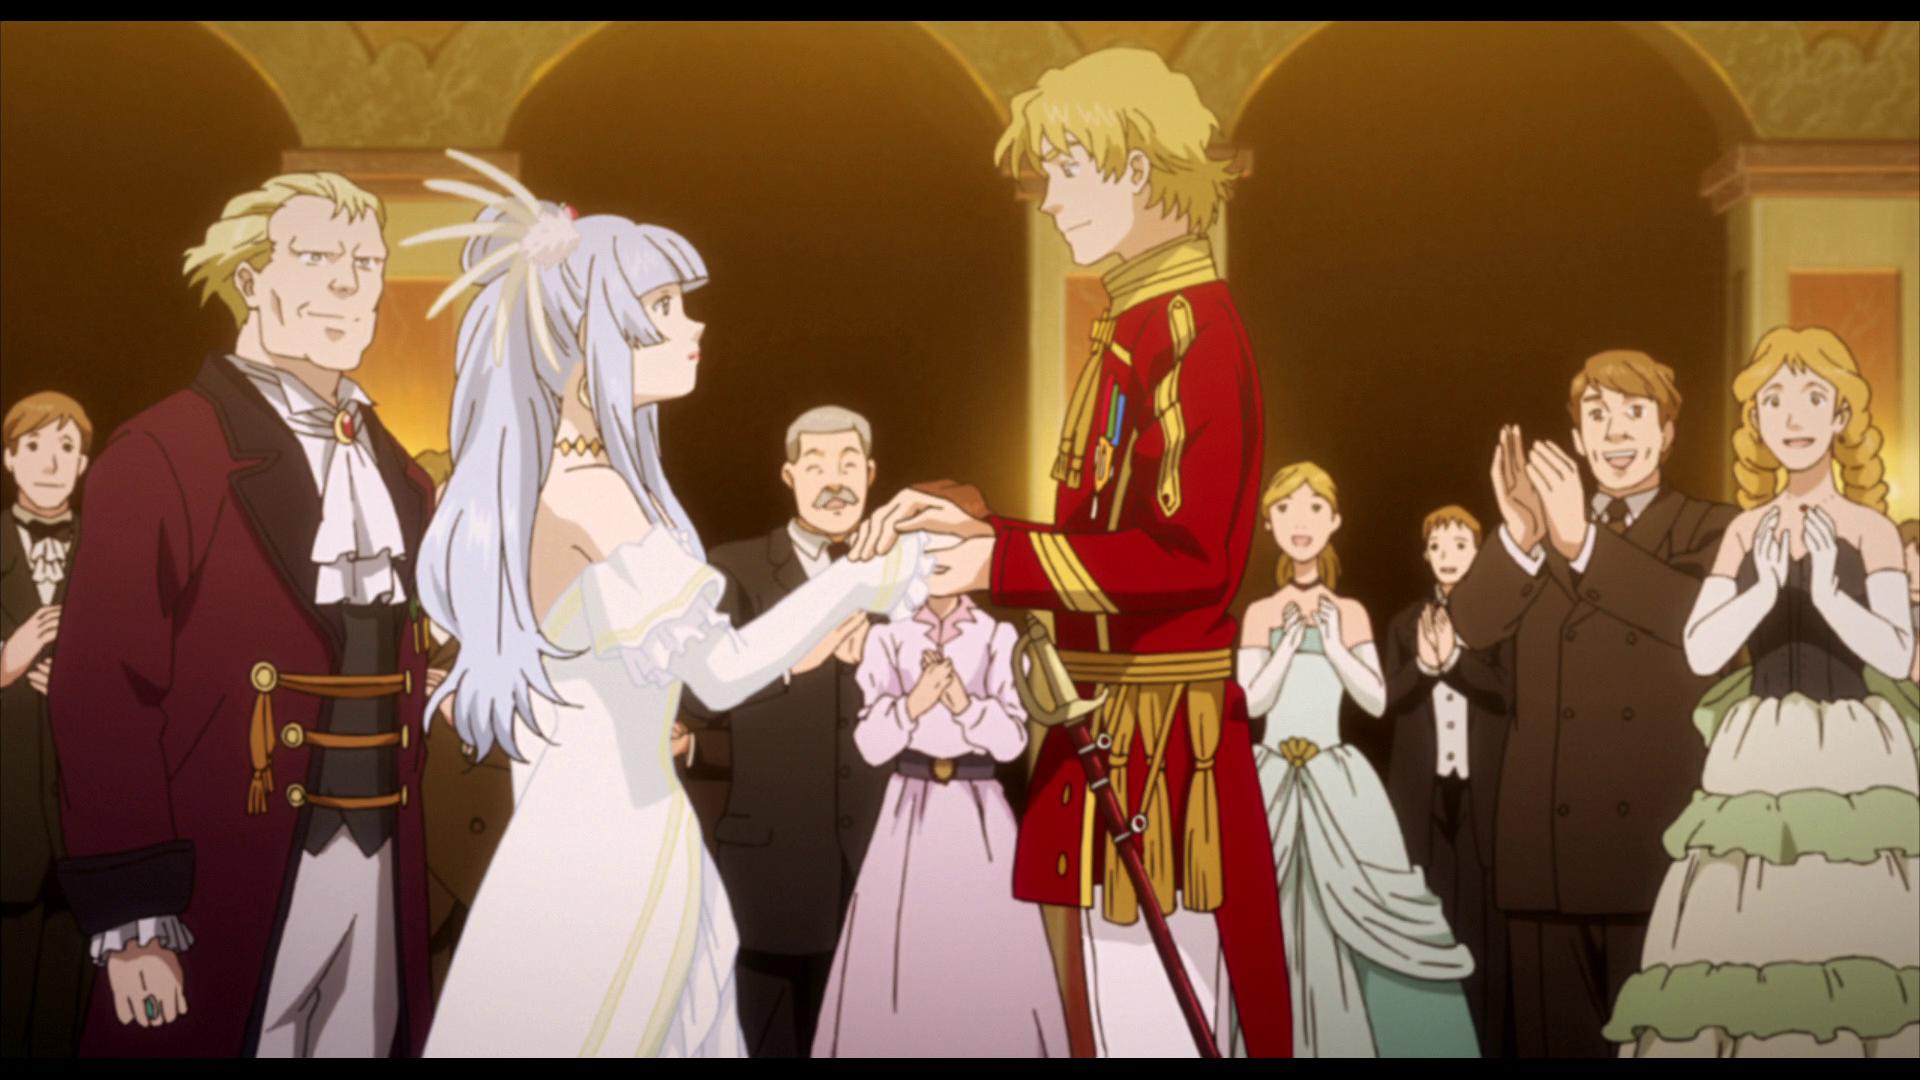 La Princesa y el Piloto | HD | Lat/Jap+Sub | MKV-1080p | x264 La_Princesa_y_el_Piloto_03